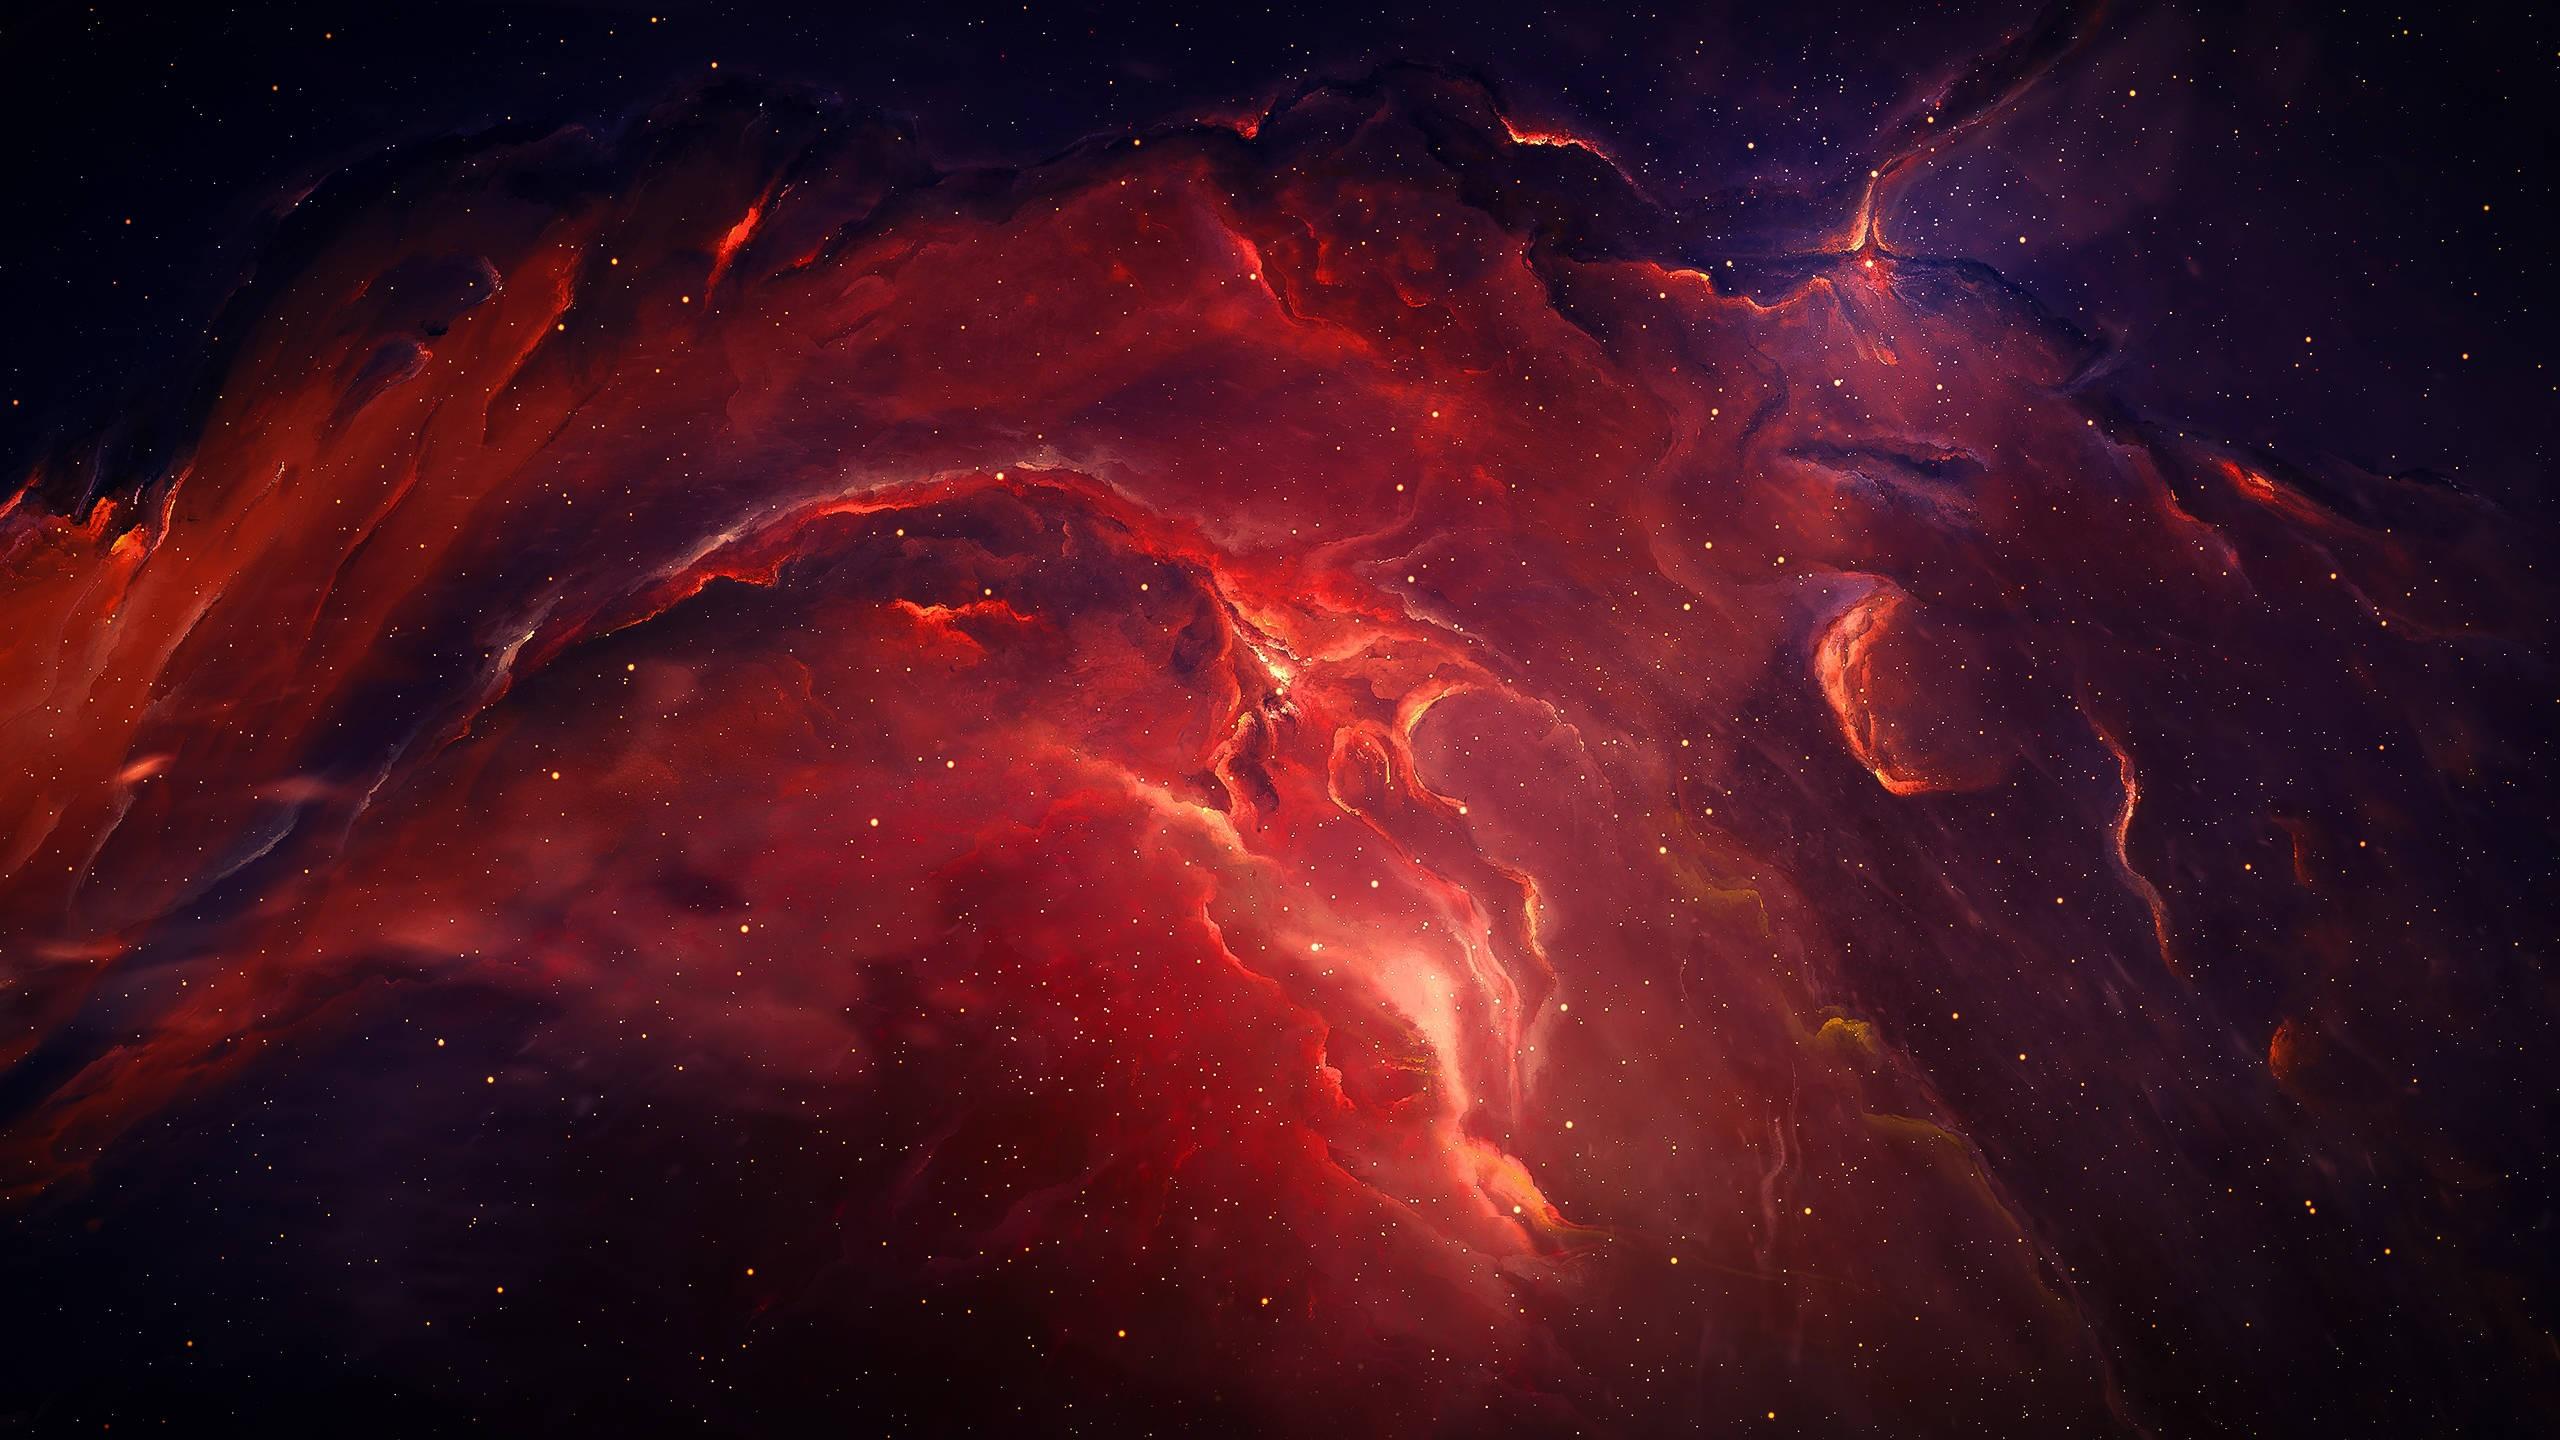 Iphone 5 Wallpaper Star Trek Nebula Wallpapers Hd Wallpapers Id 25533